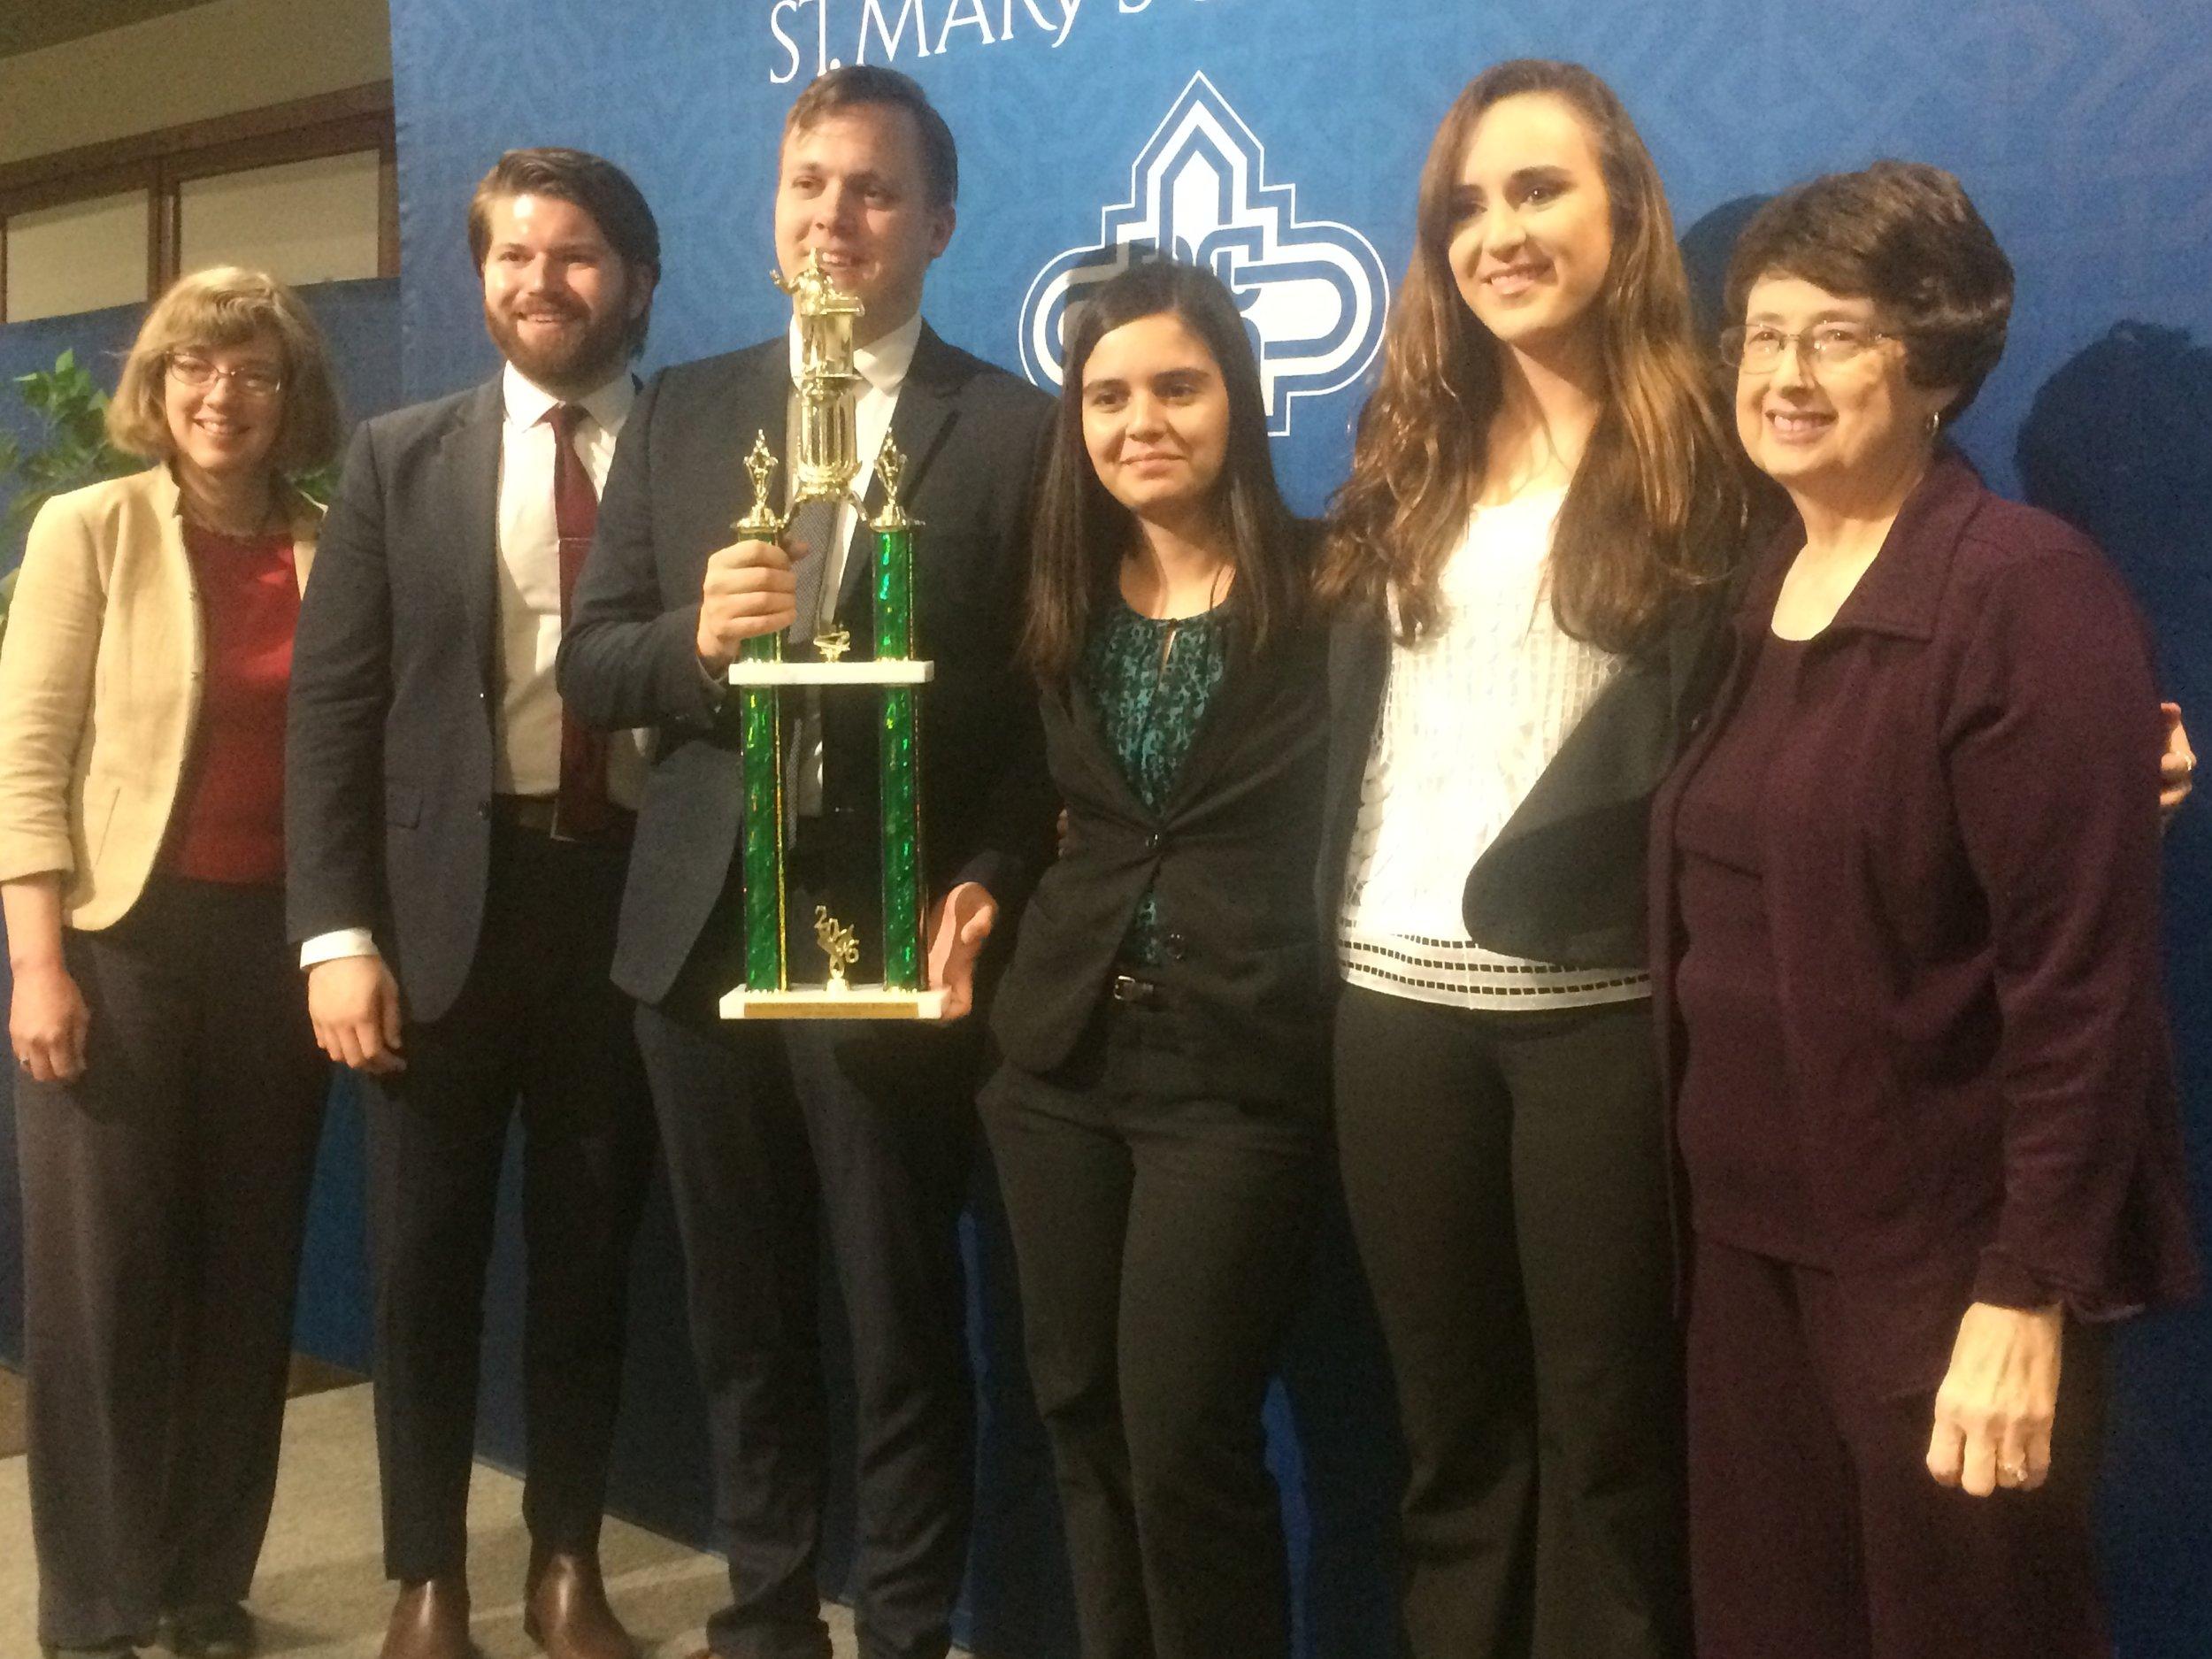 Texas Region Ethics Bowl 2016 Winner  University of Central Oklahoma - team Bronchos